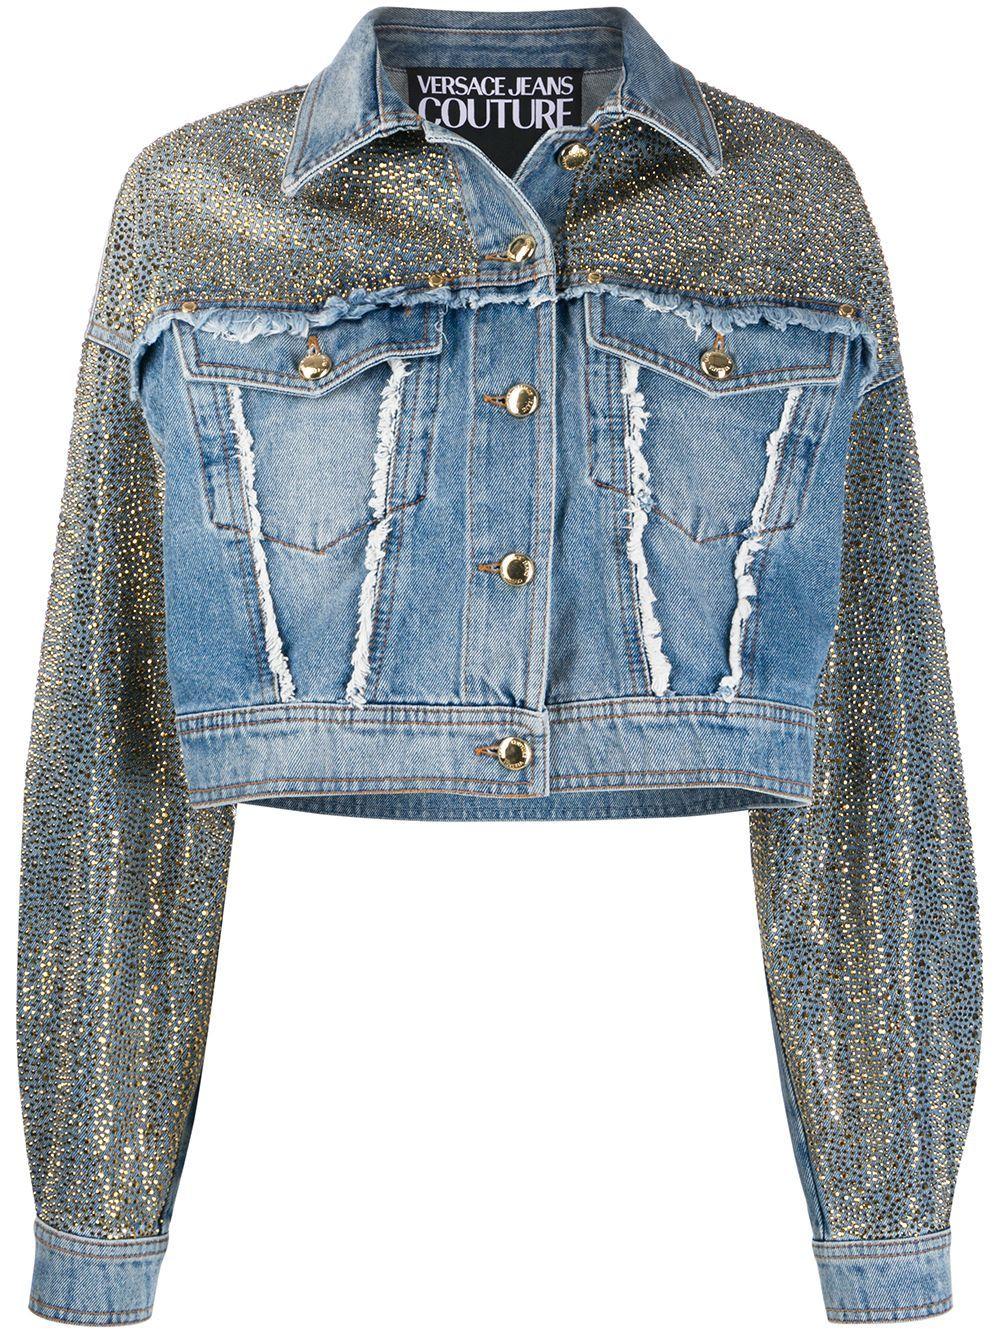 Versace Jeans Couture Studded Frayed Detail Jacket Farfetch Studded Denim Jacket Denim Design Upcycle Jeans [ 1334 x 1000 Pixel ]